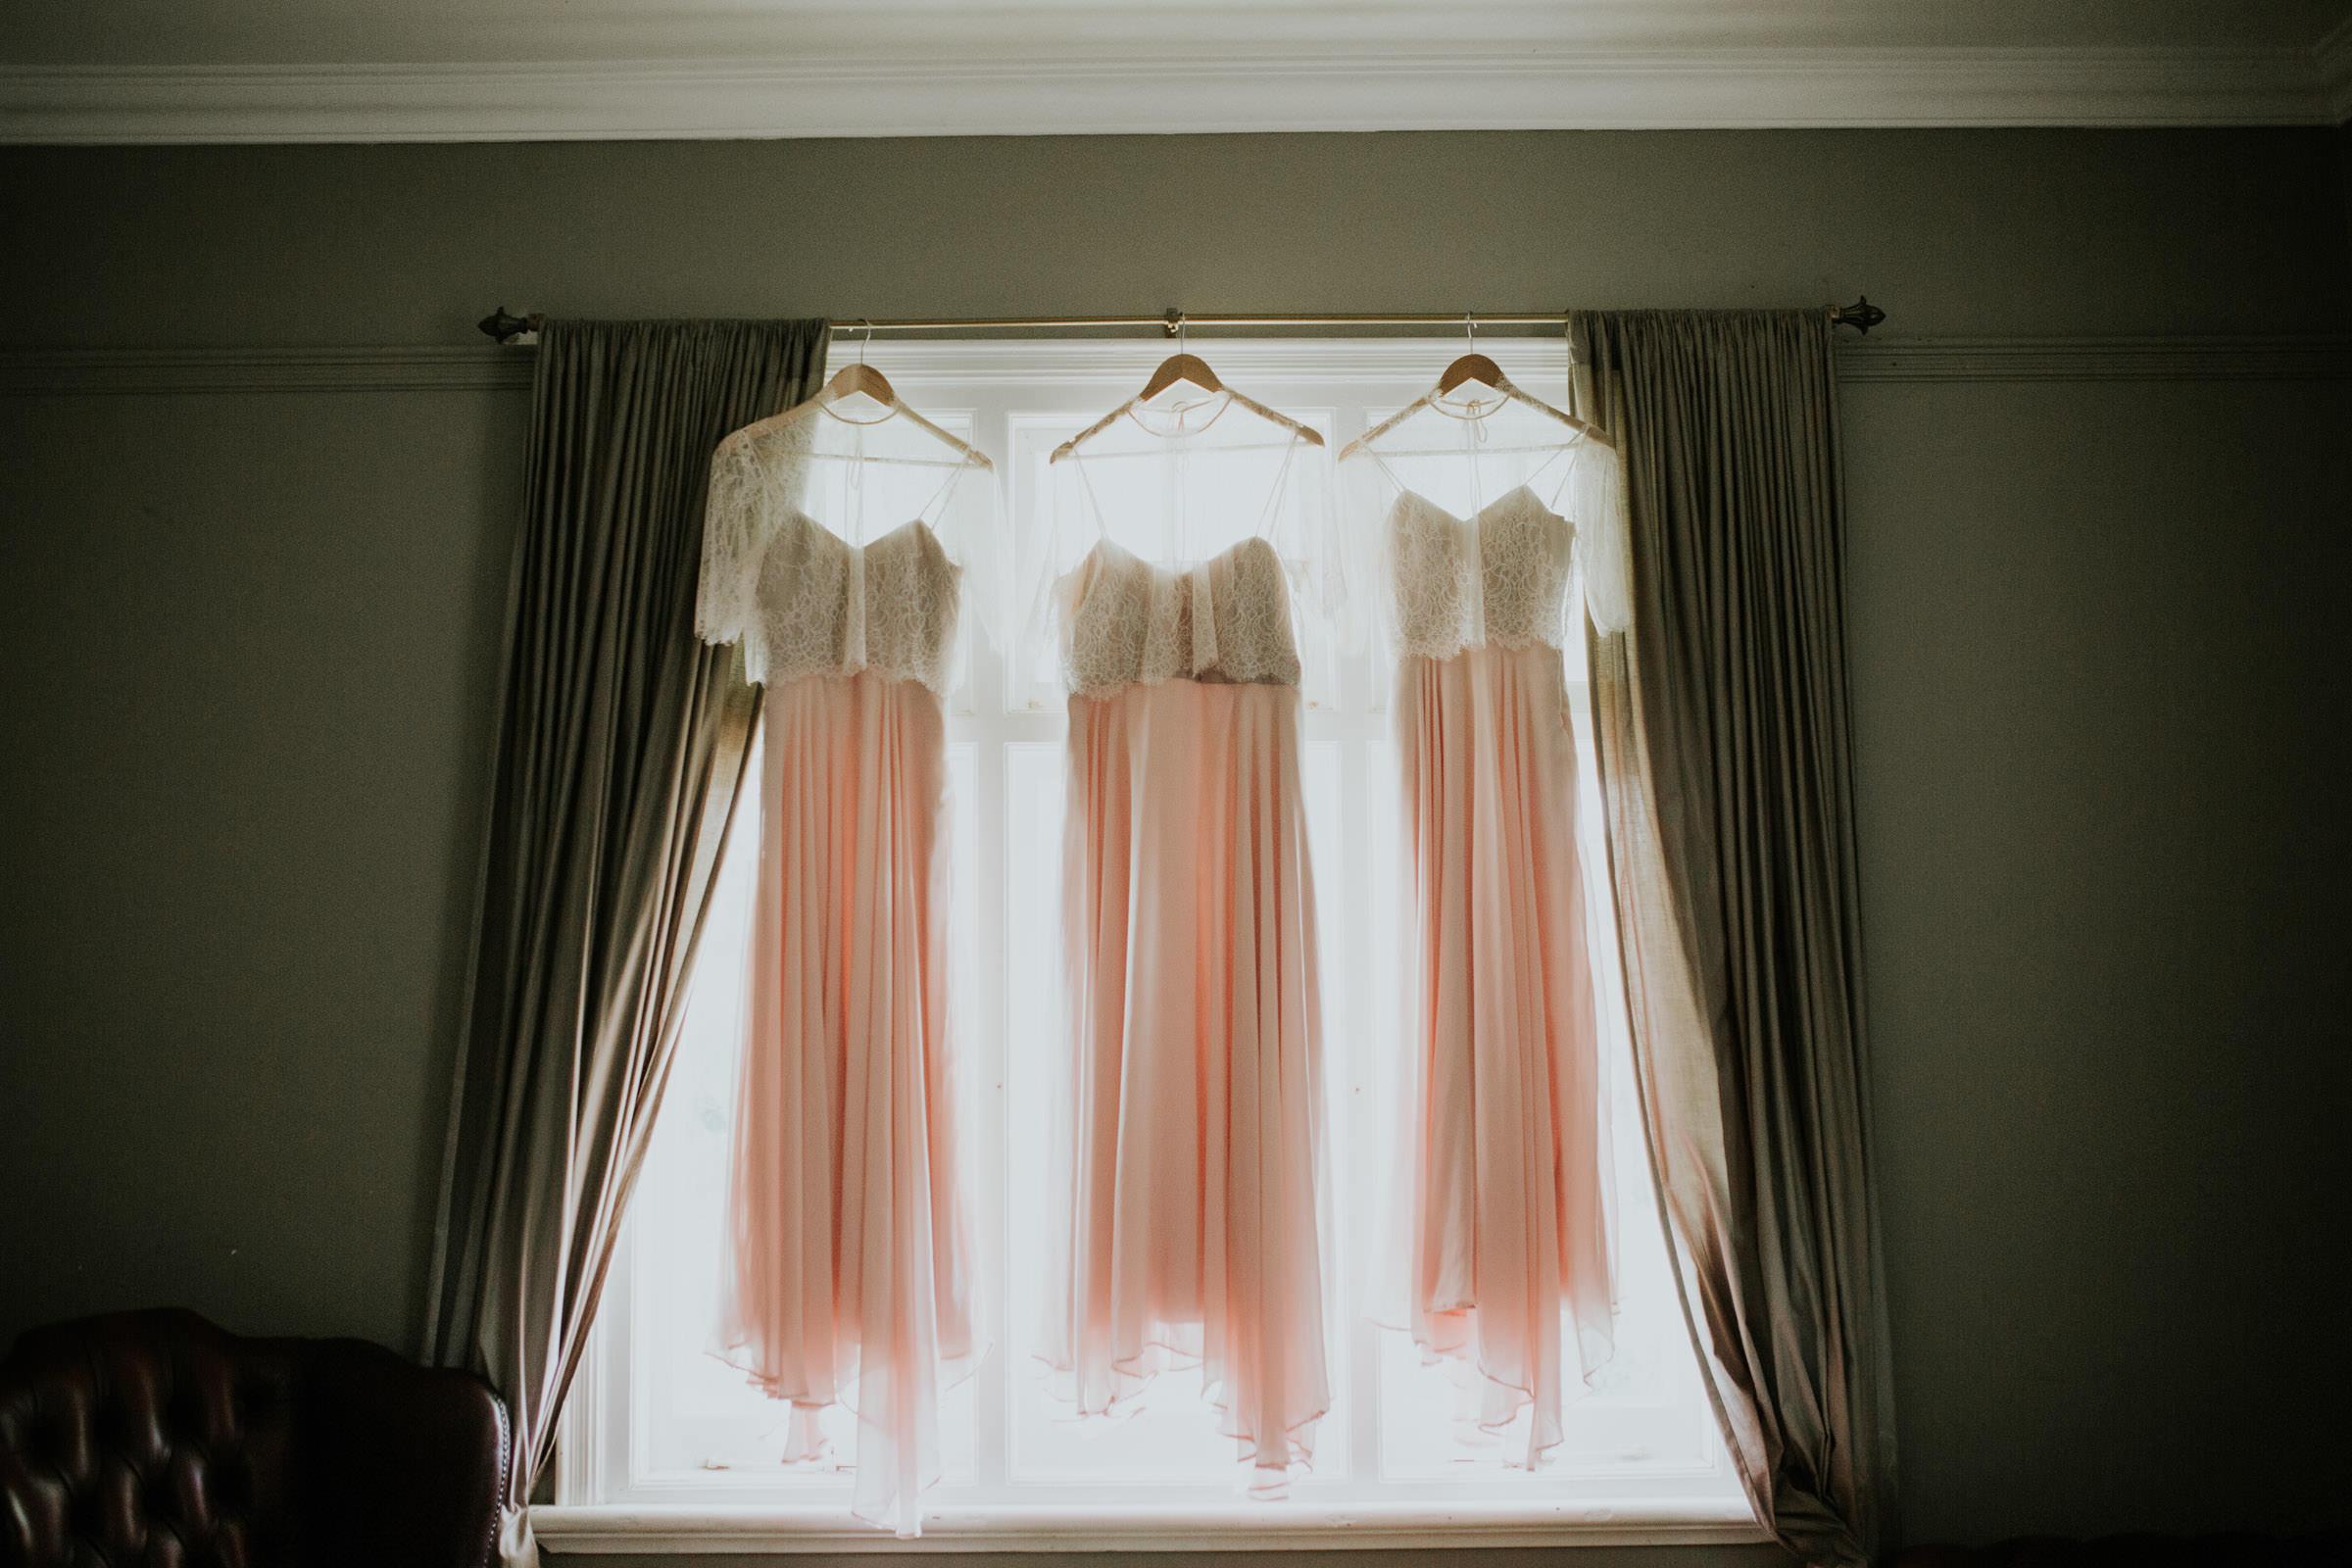 Emma+John+Far+South+Coast+Wedding+Festivl+Glamping+Bush-7.jpg